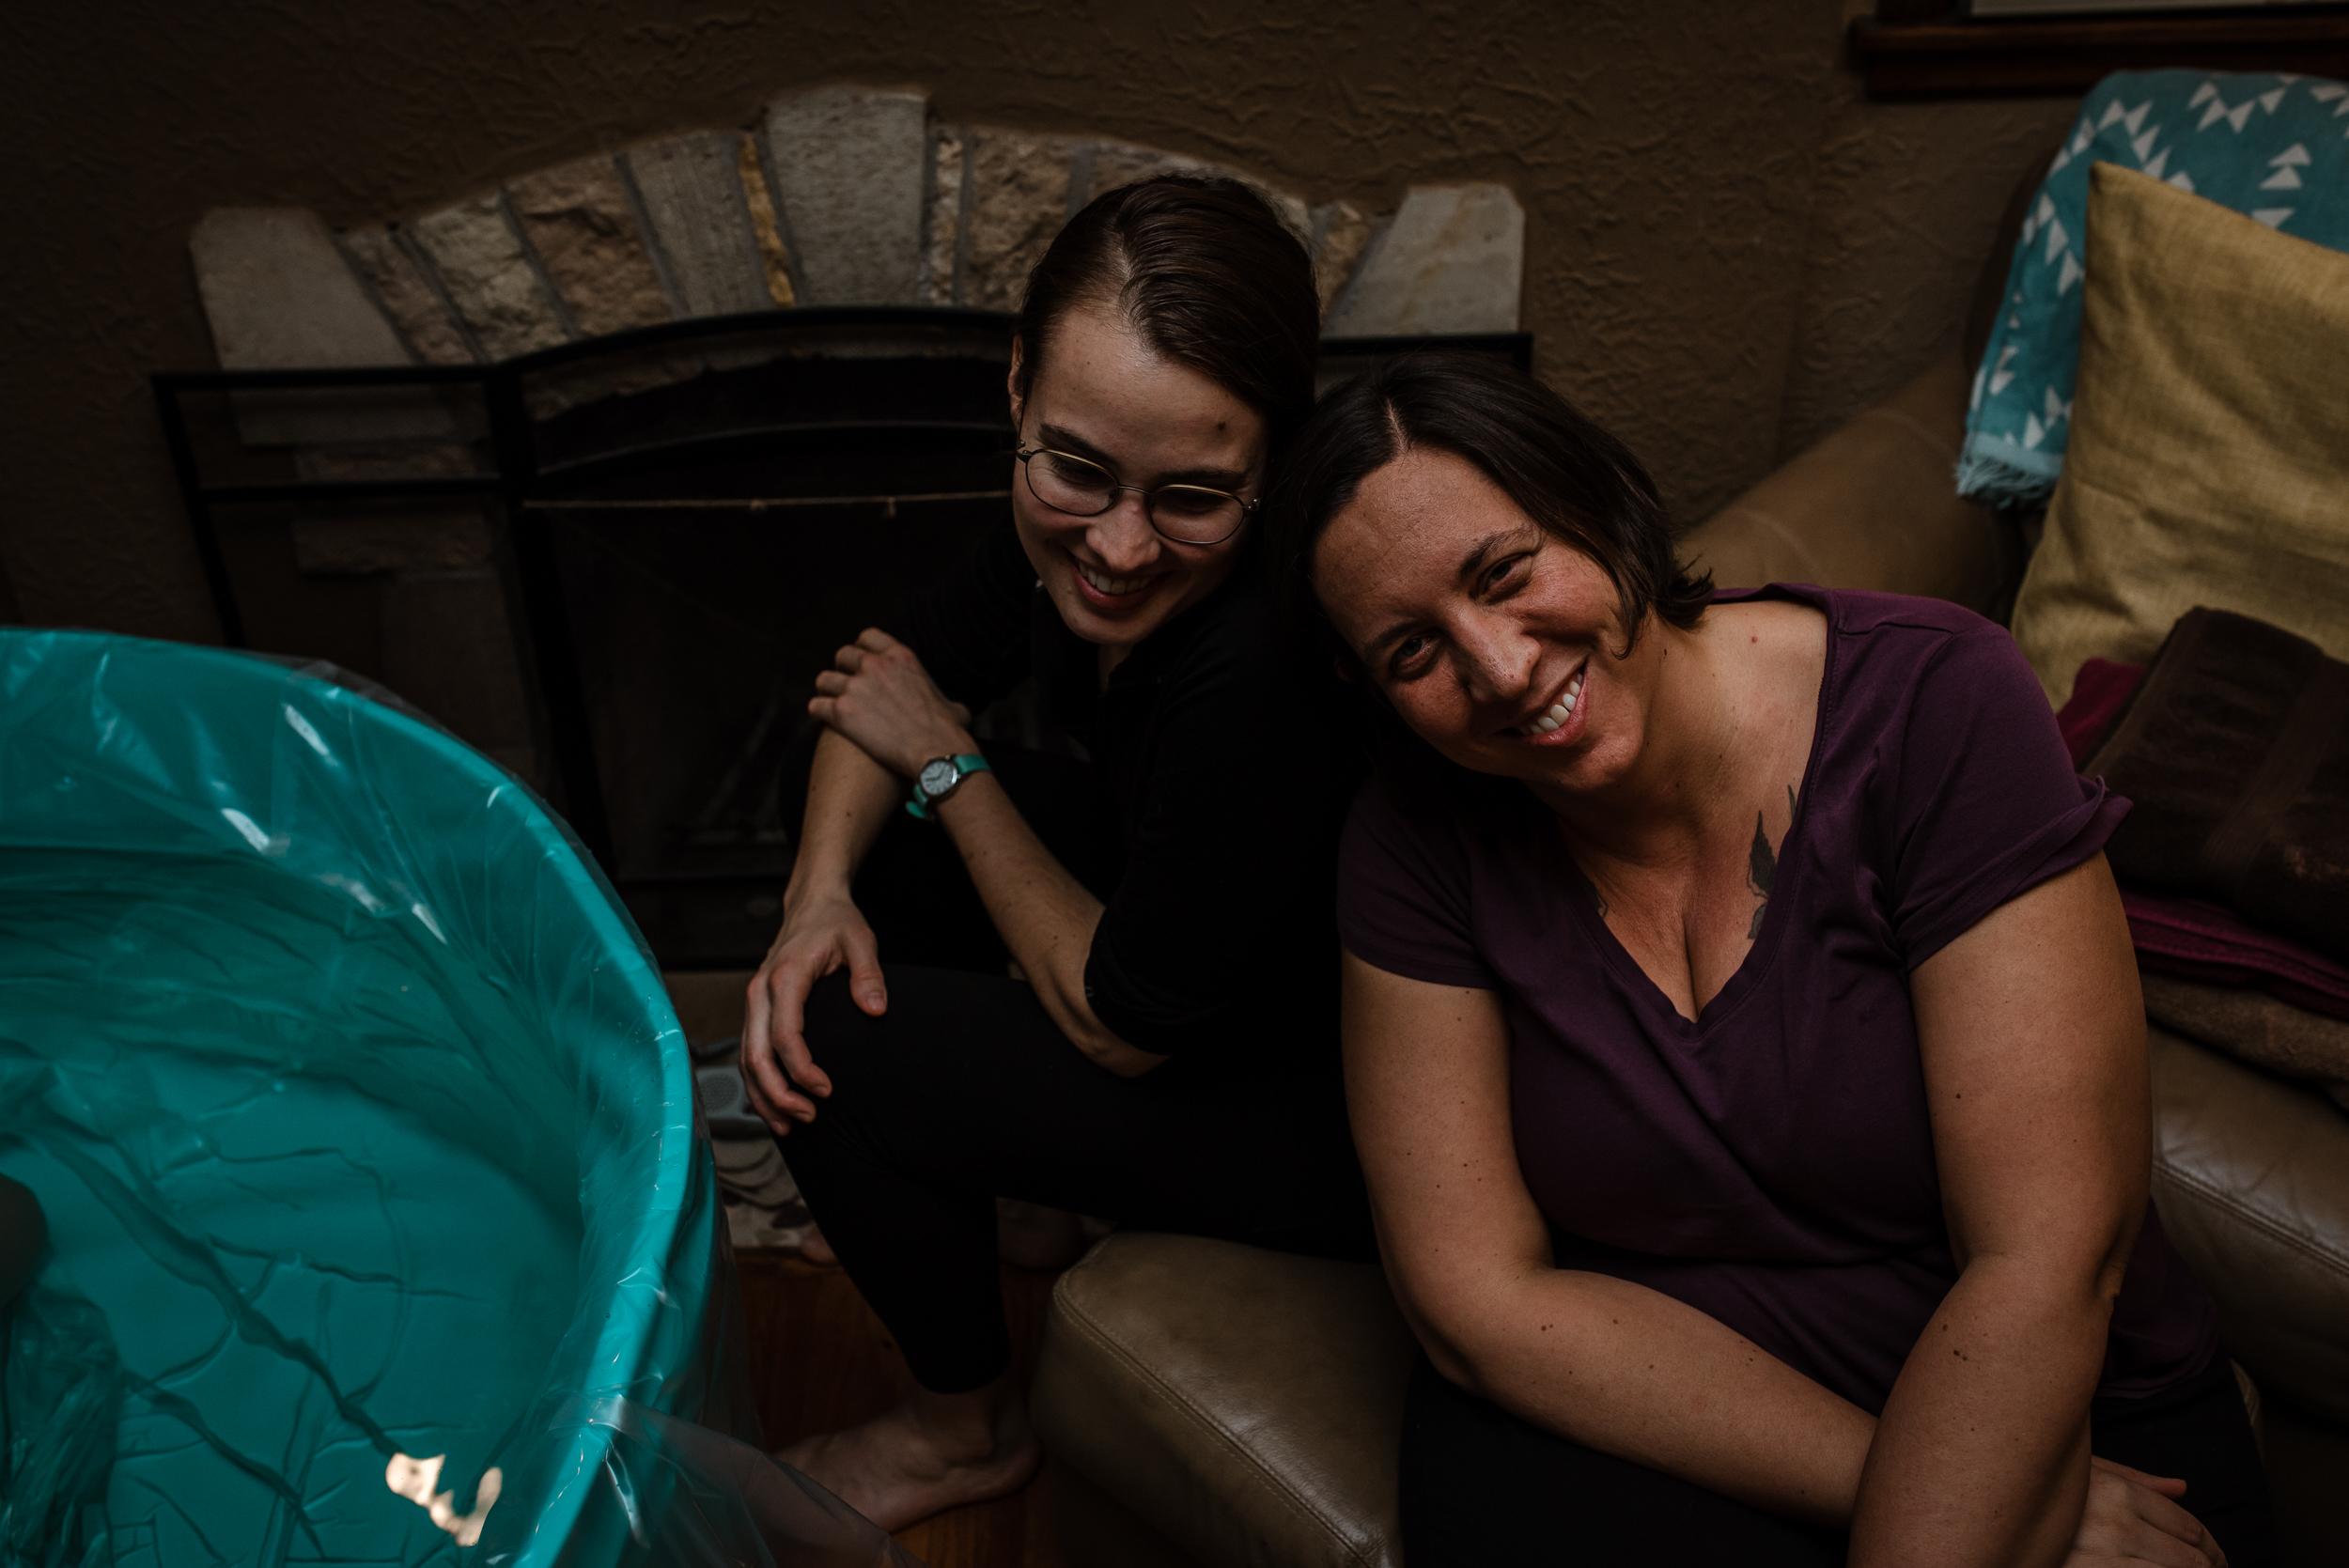 Meredith Westin Photography- Minneapolis Birth Stories and Films-November 08, 2018-170447.jpg